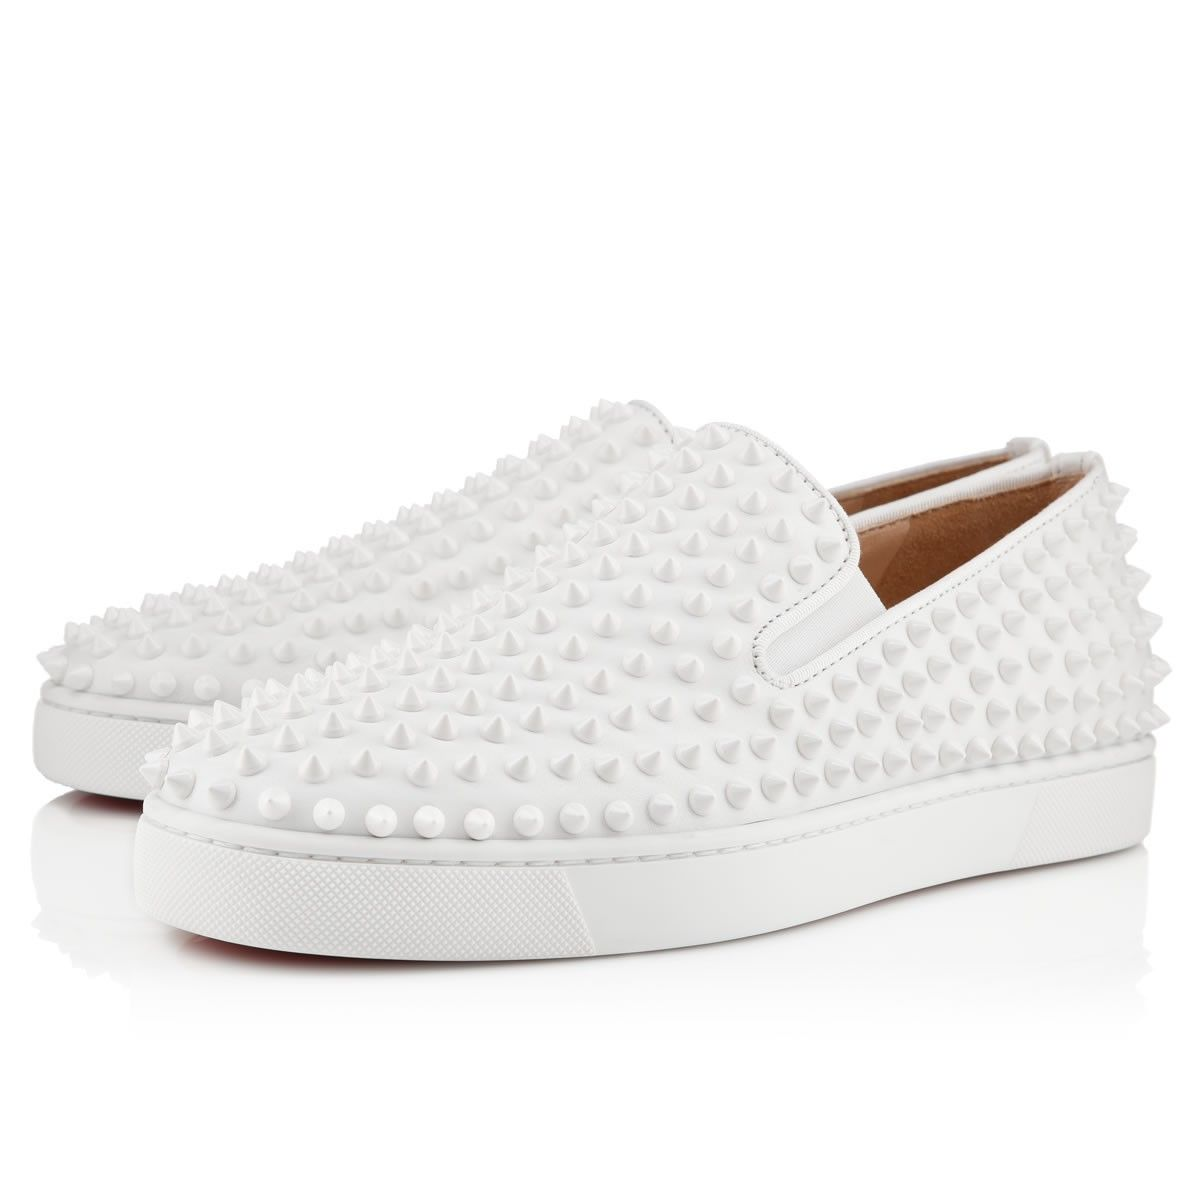 ROLLER BOAT MEN'S FLAT   Christian louboutin shoes